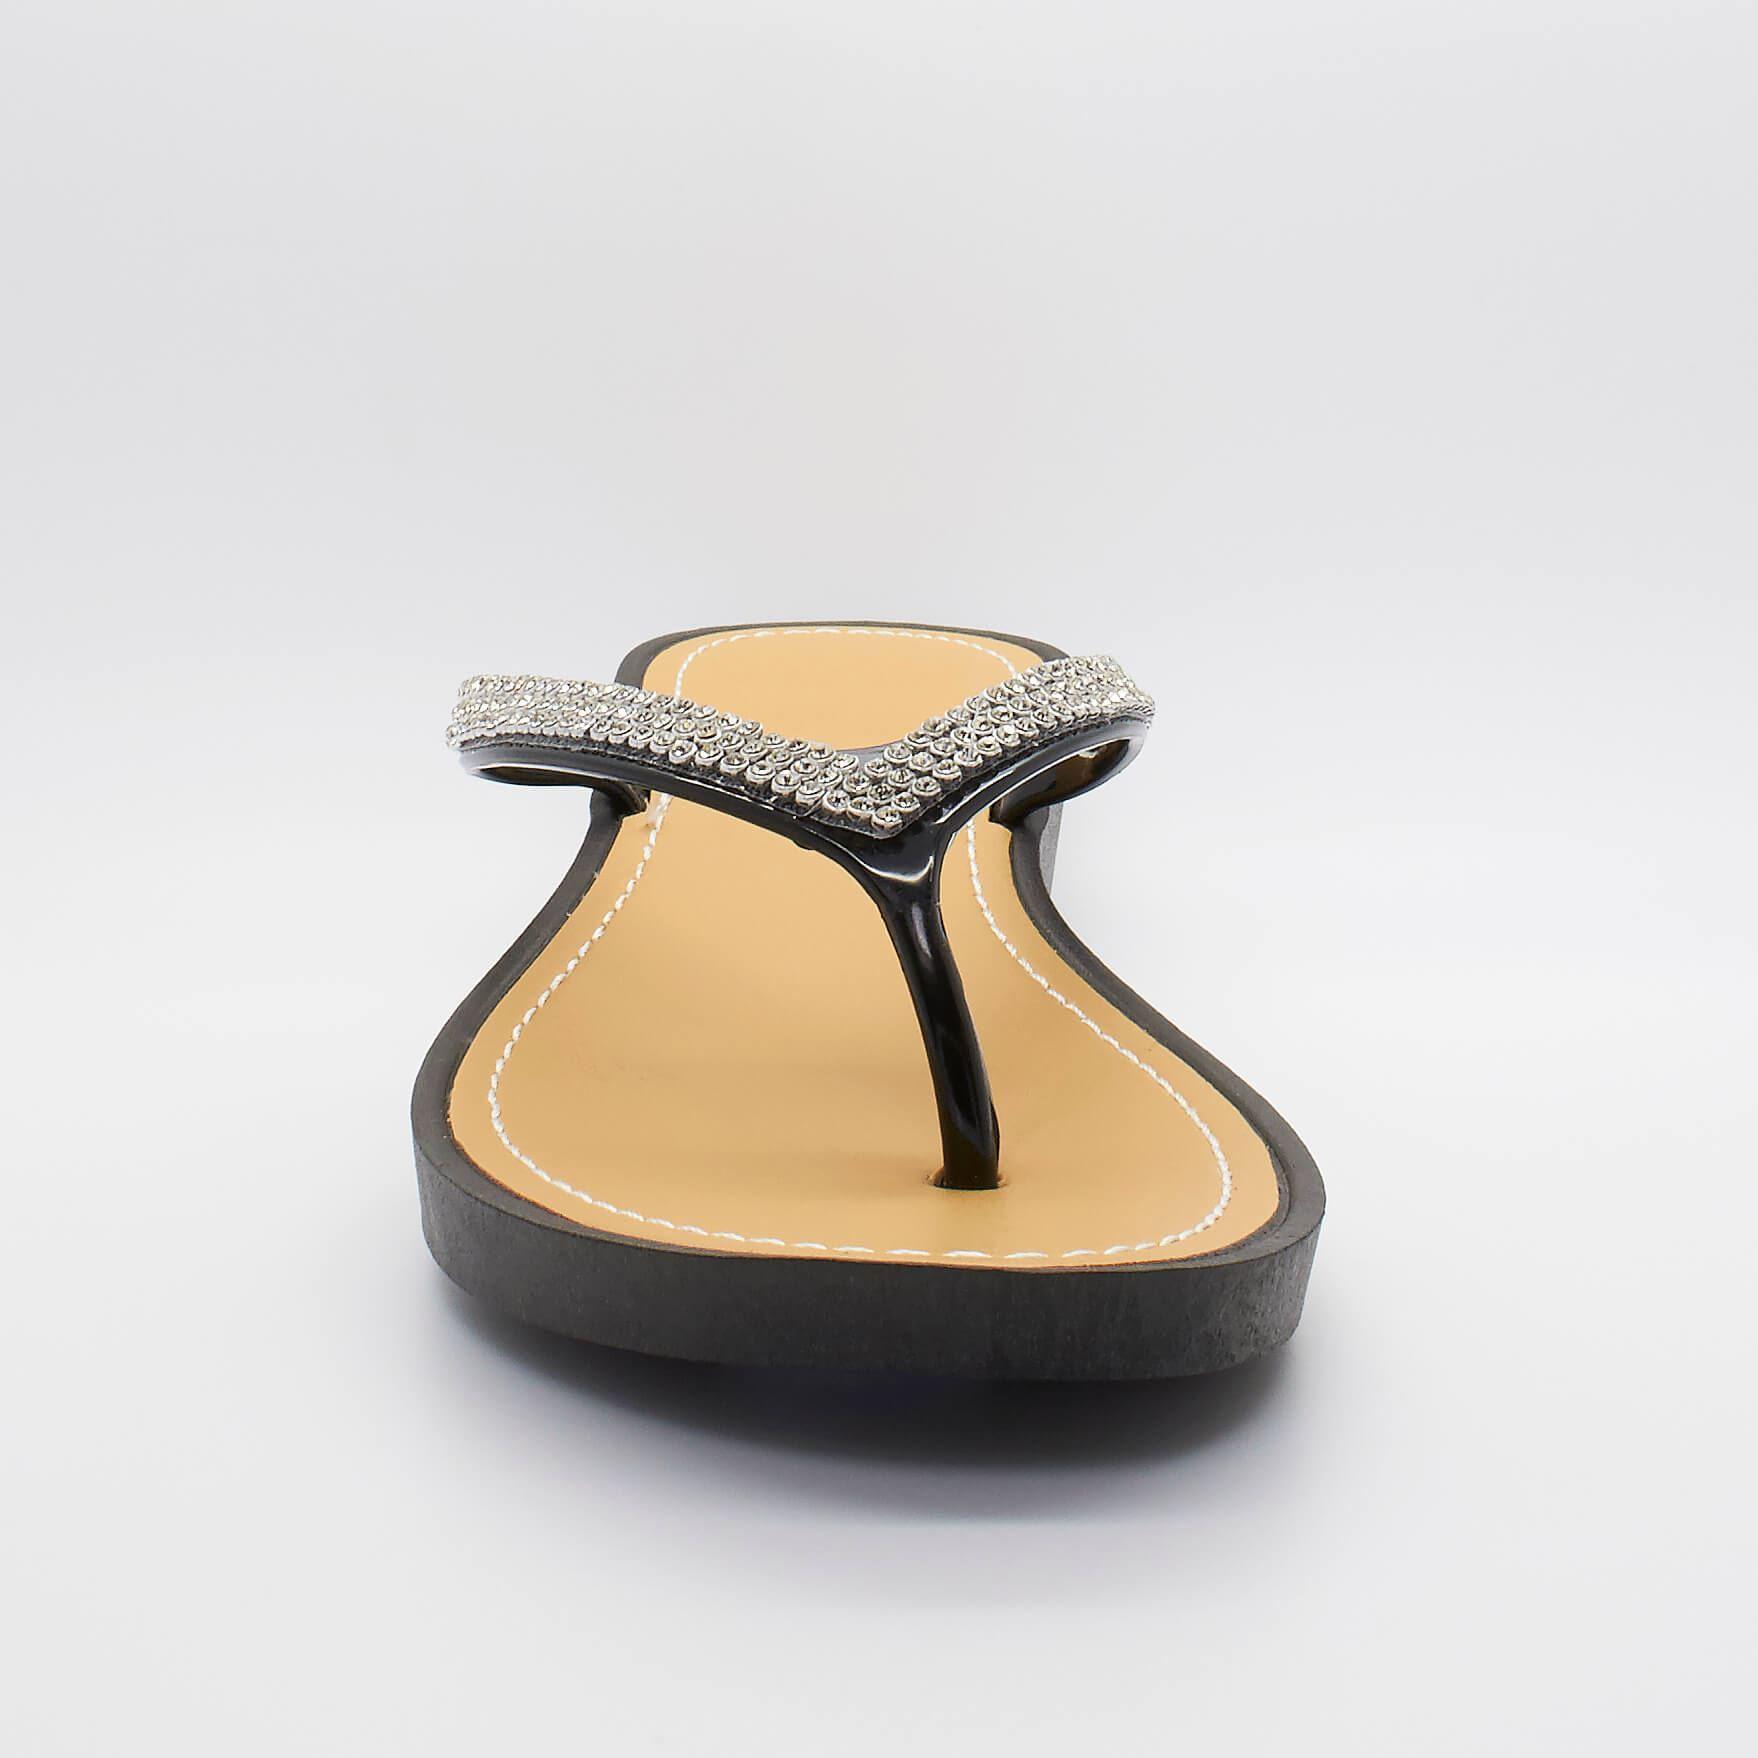 Womens New Ladies Low Wedge Diamante Sandals Toe Post Flip -7559